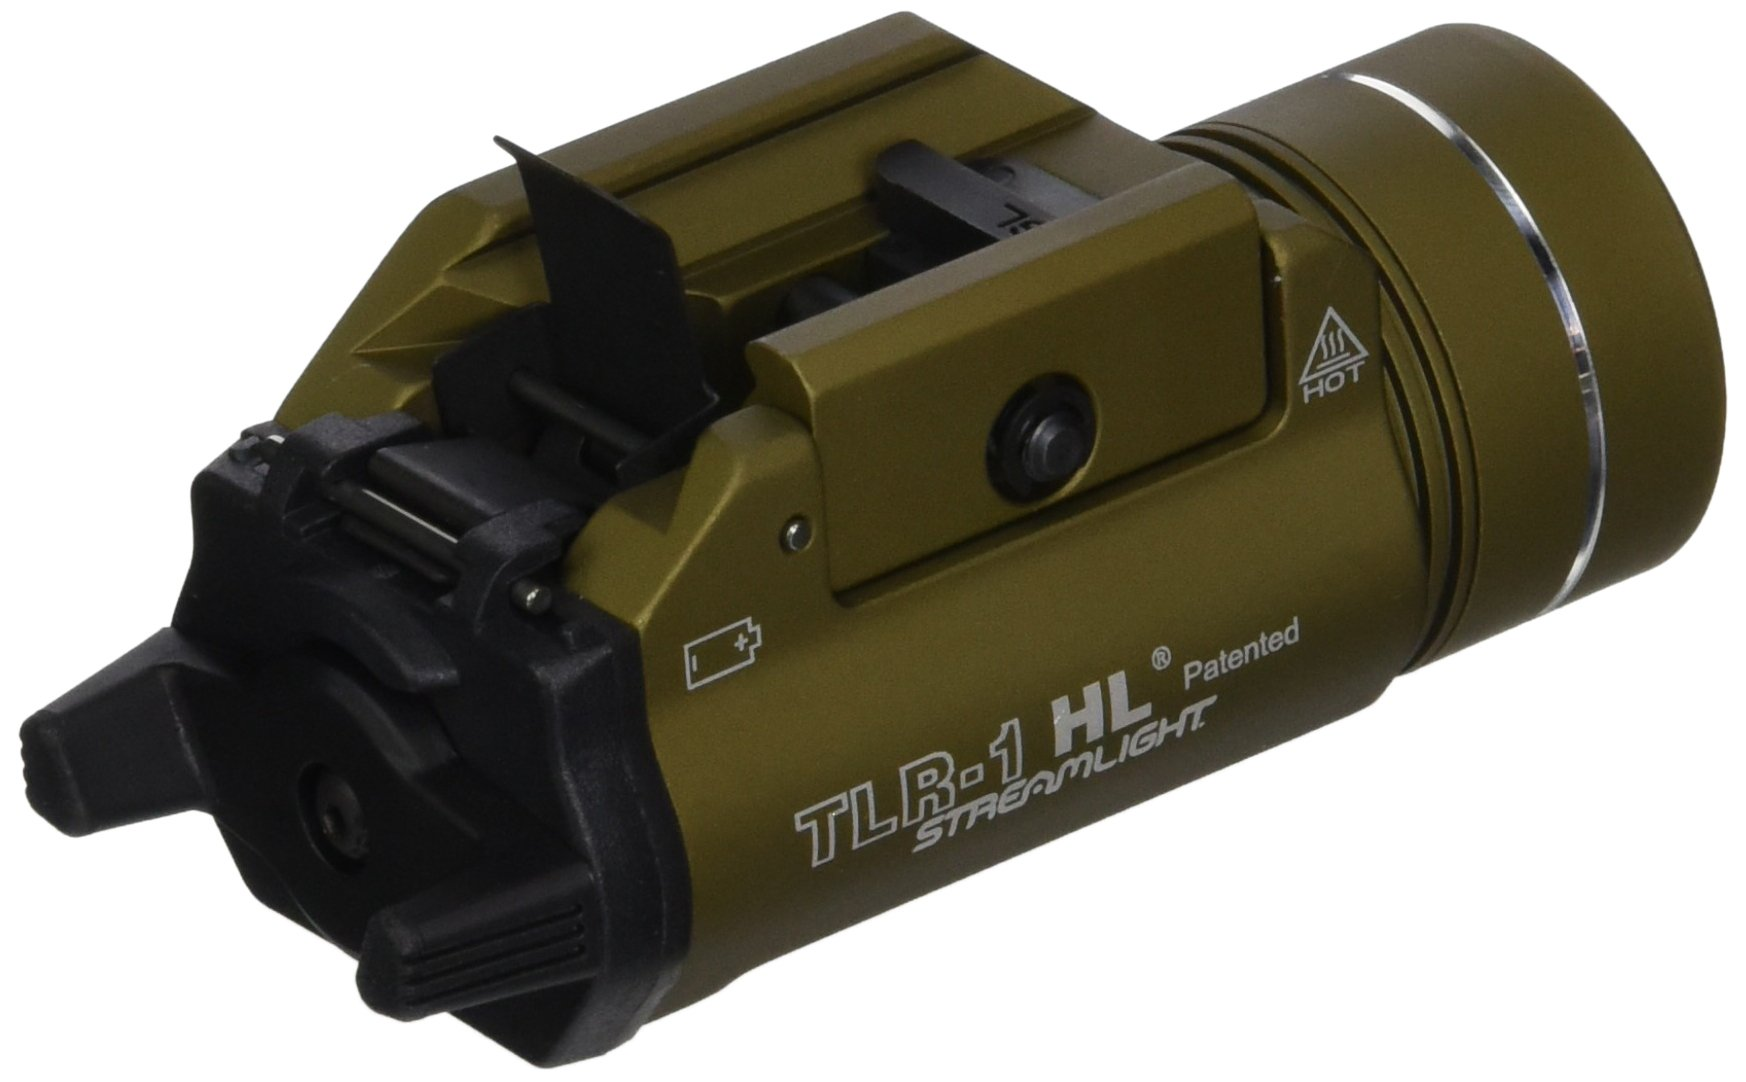 Streamlight 69266 TLR-1-HL High Lumen Rail-Mounted Tactical Light, Flat Dark Earth by Streamlight (Image #2)